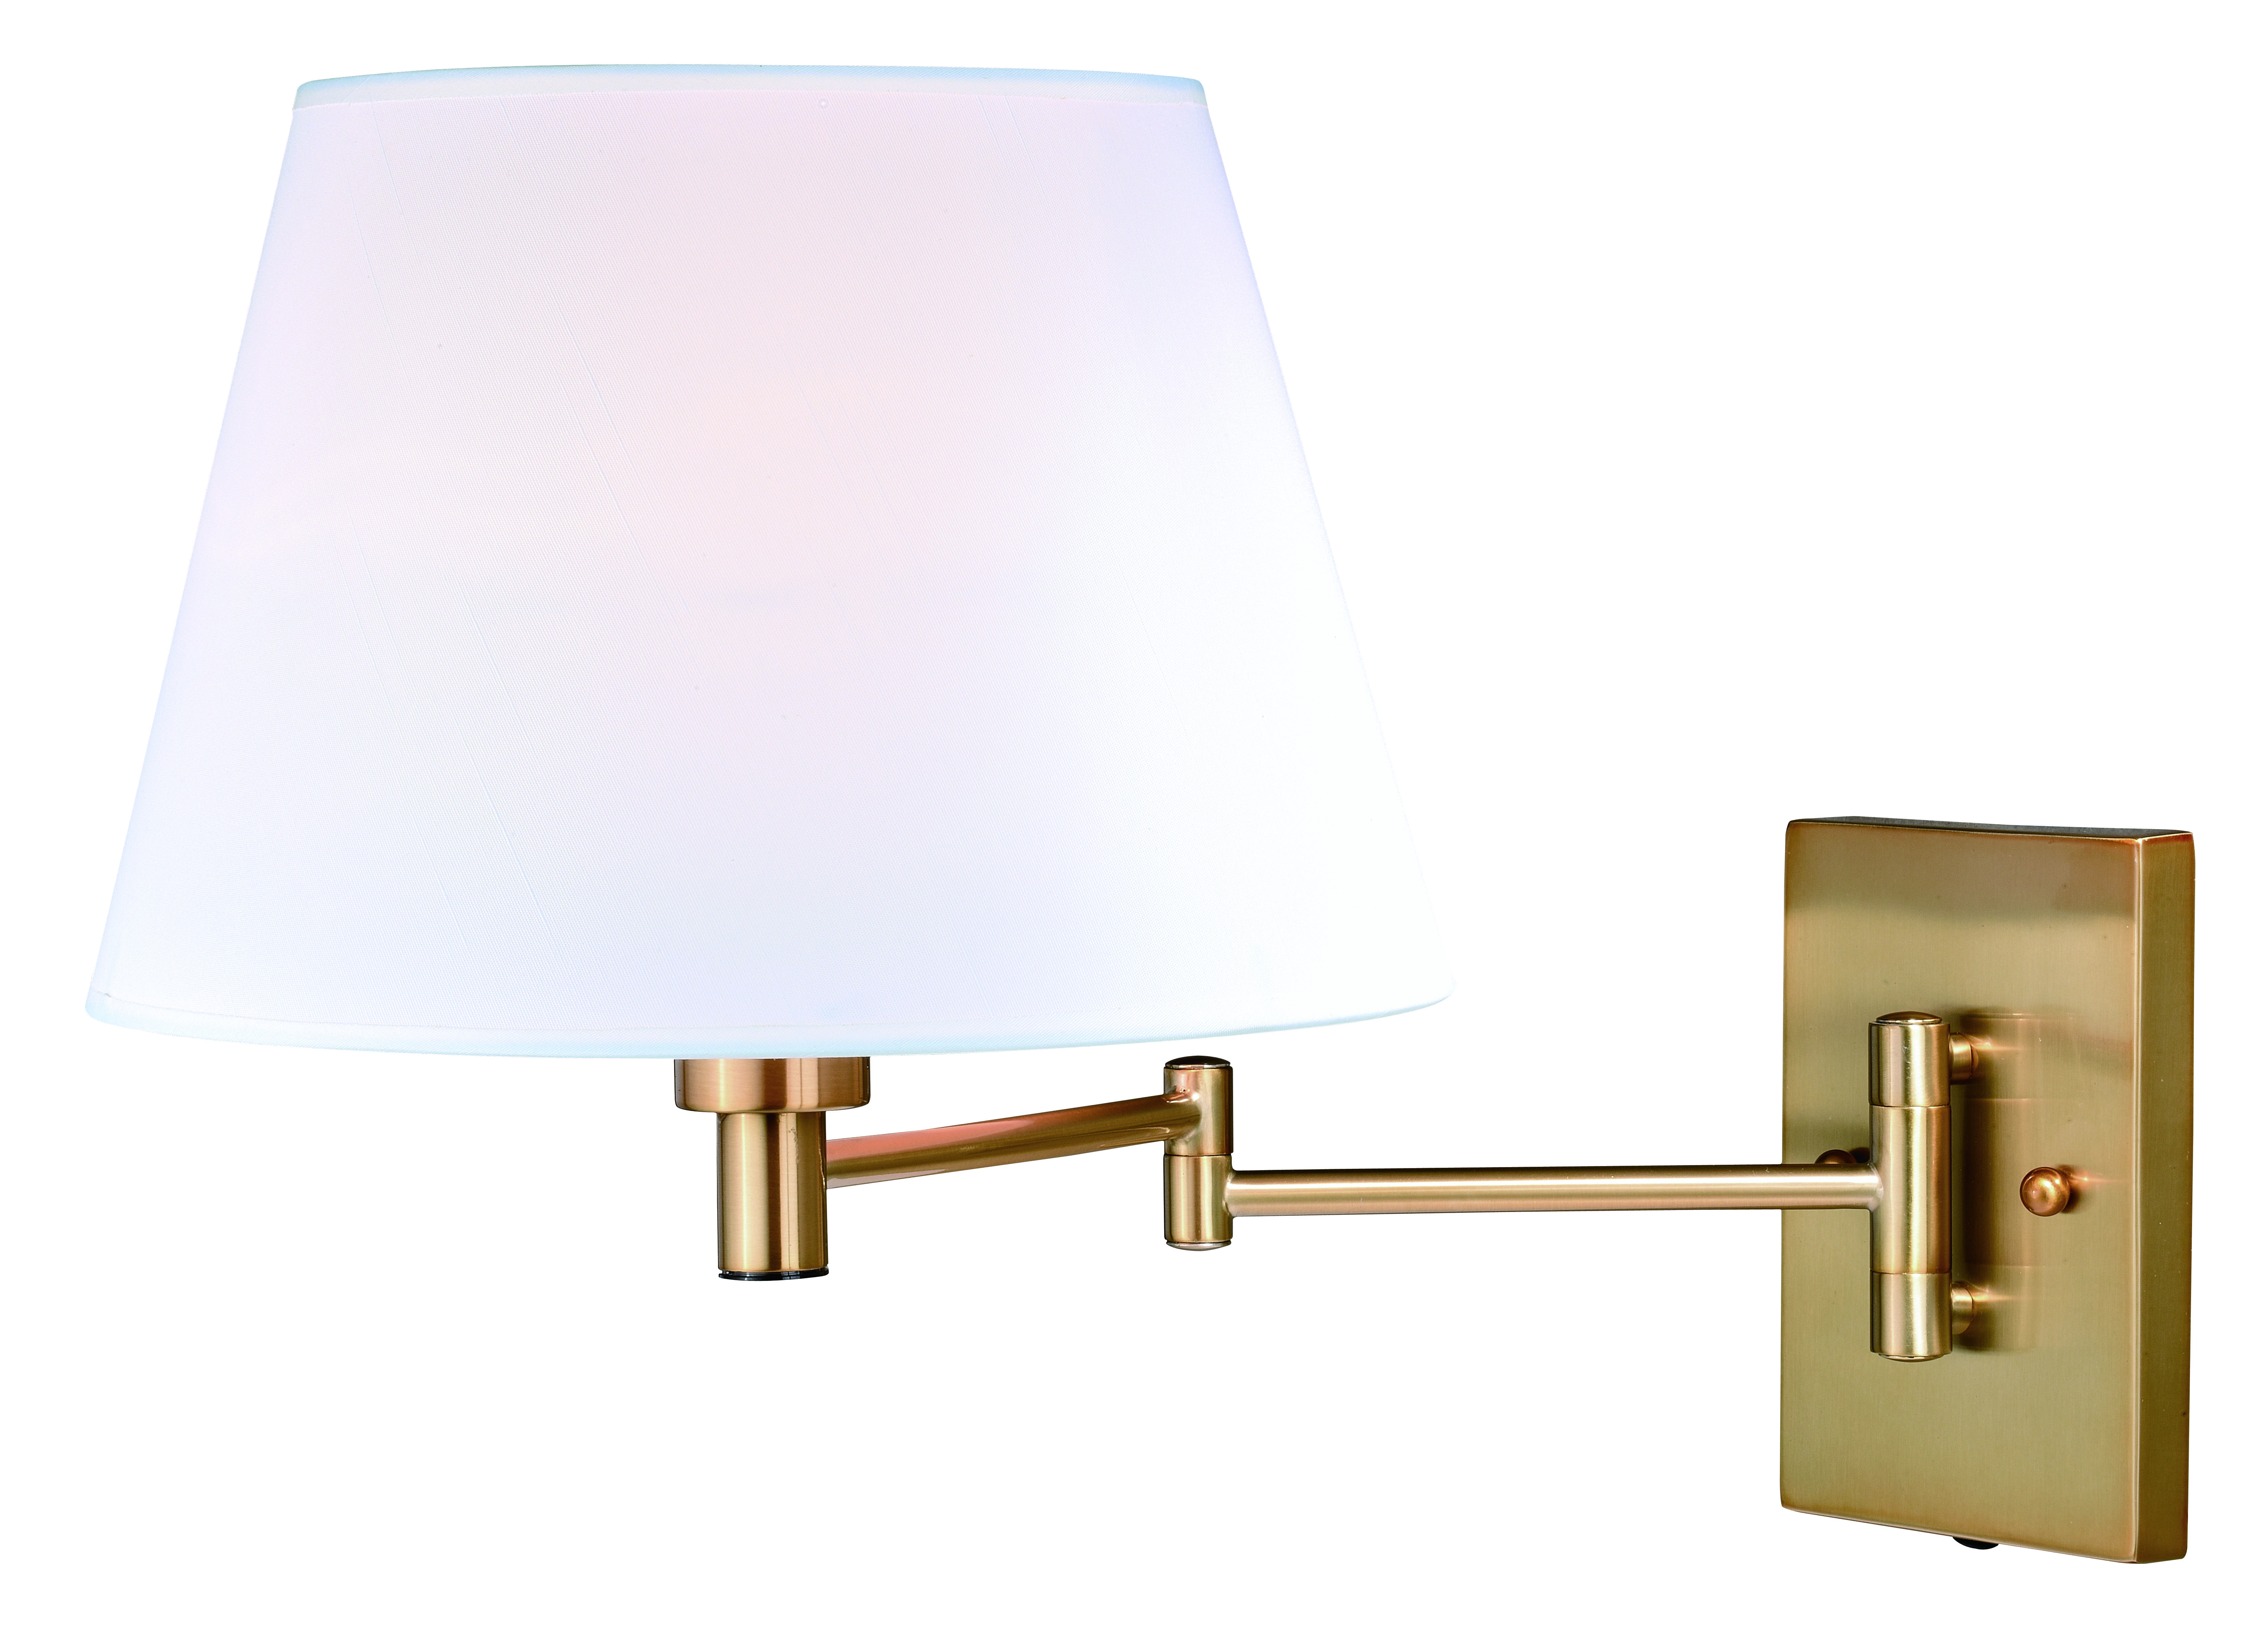 Chapeau Instalux 174 Swing Arm Wall Light Natural Brass Vaxcel